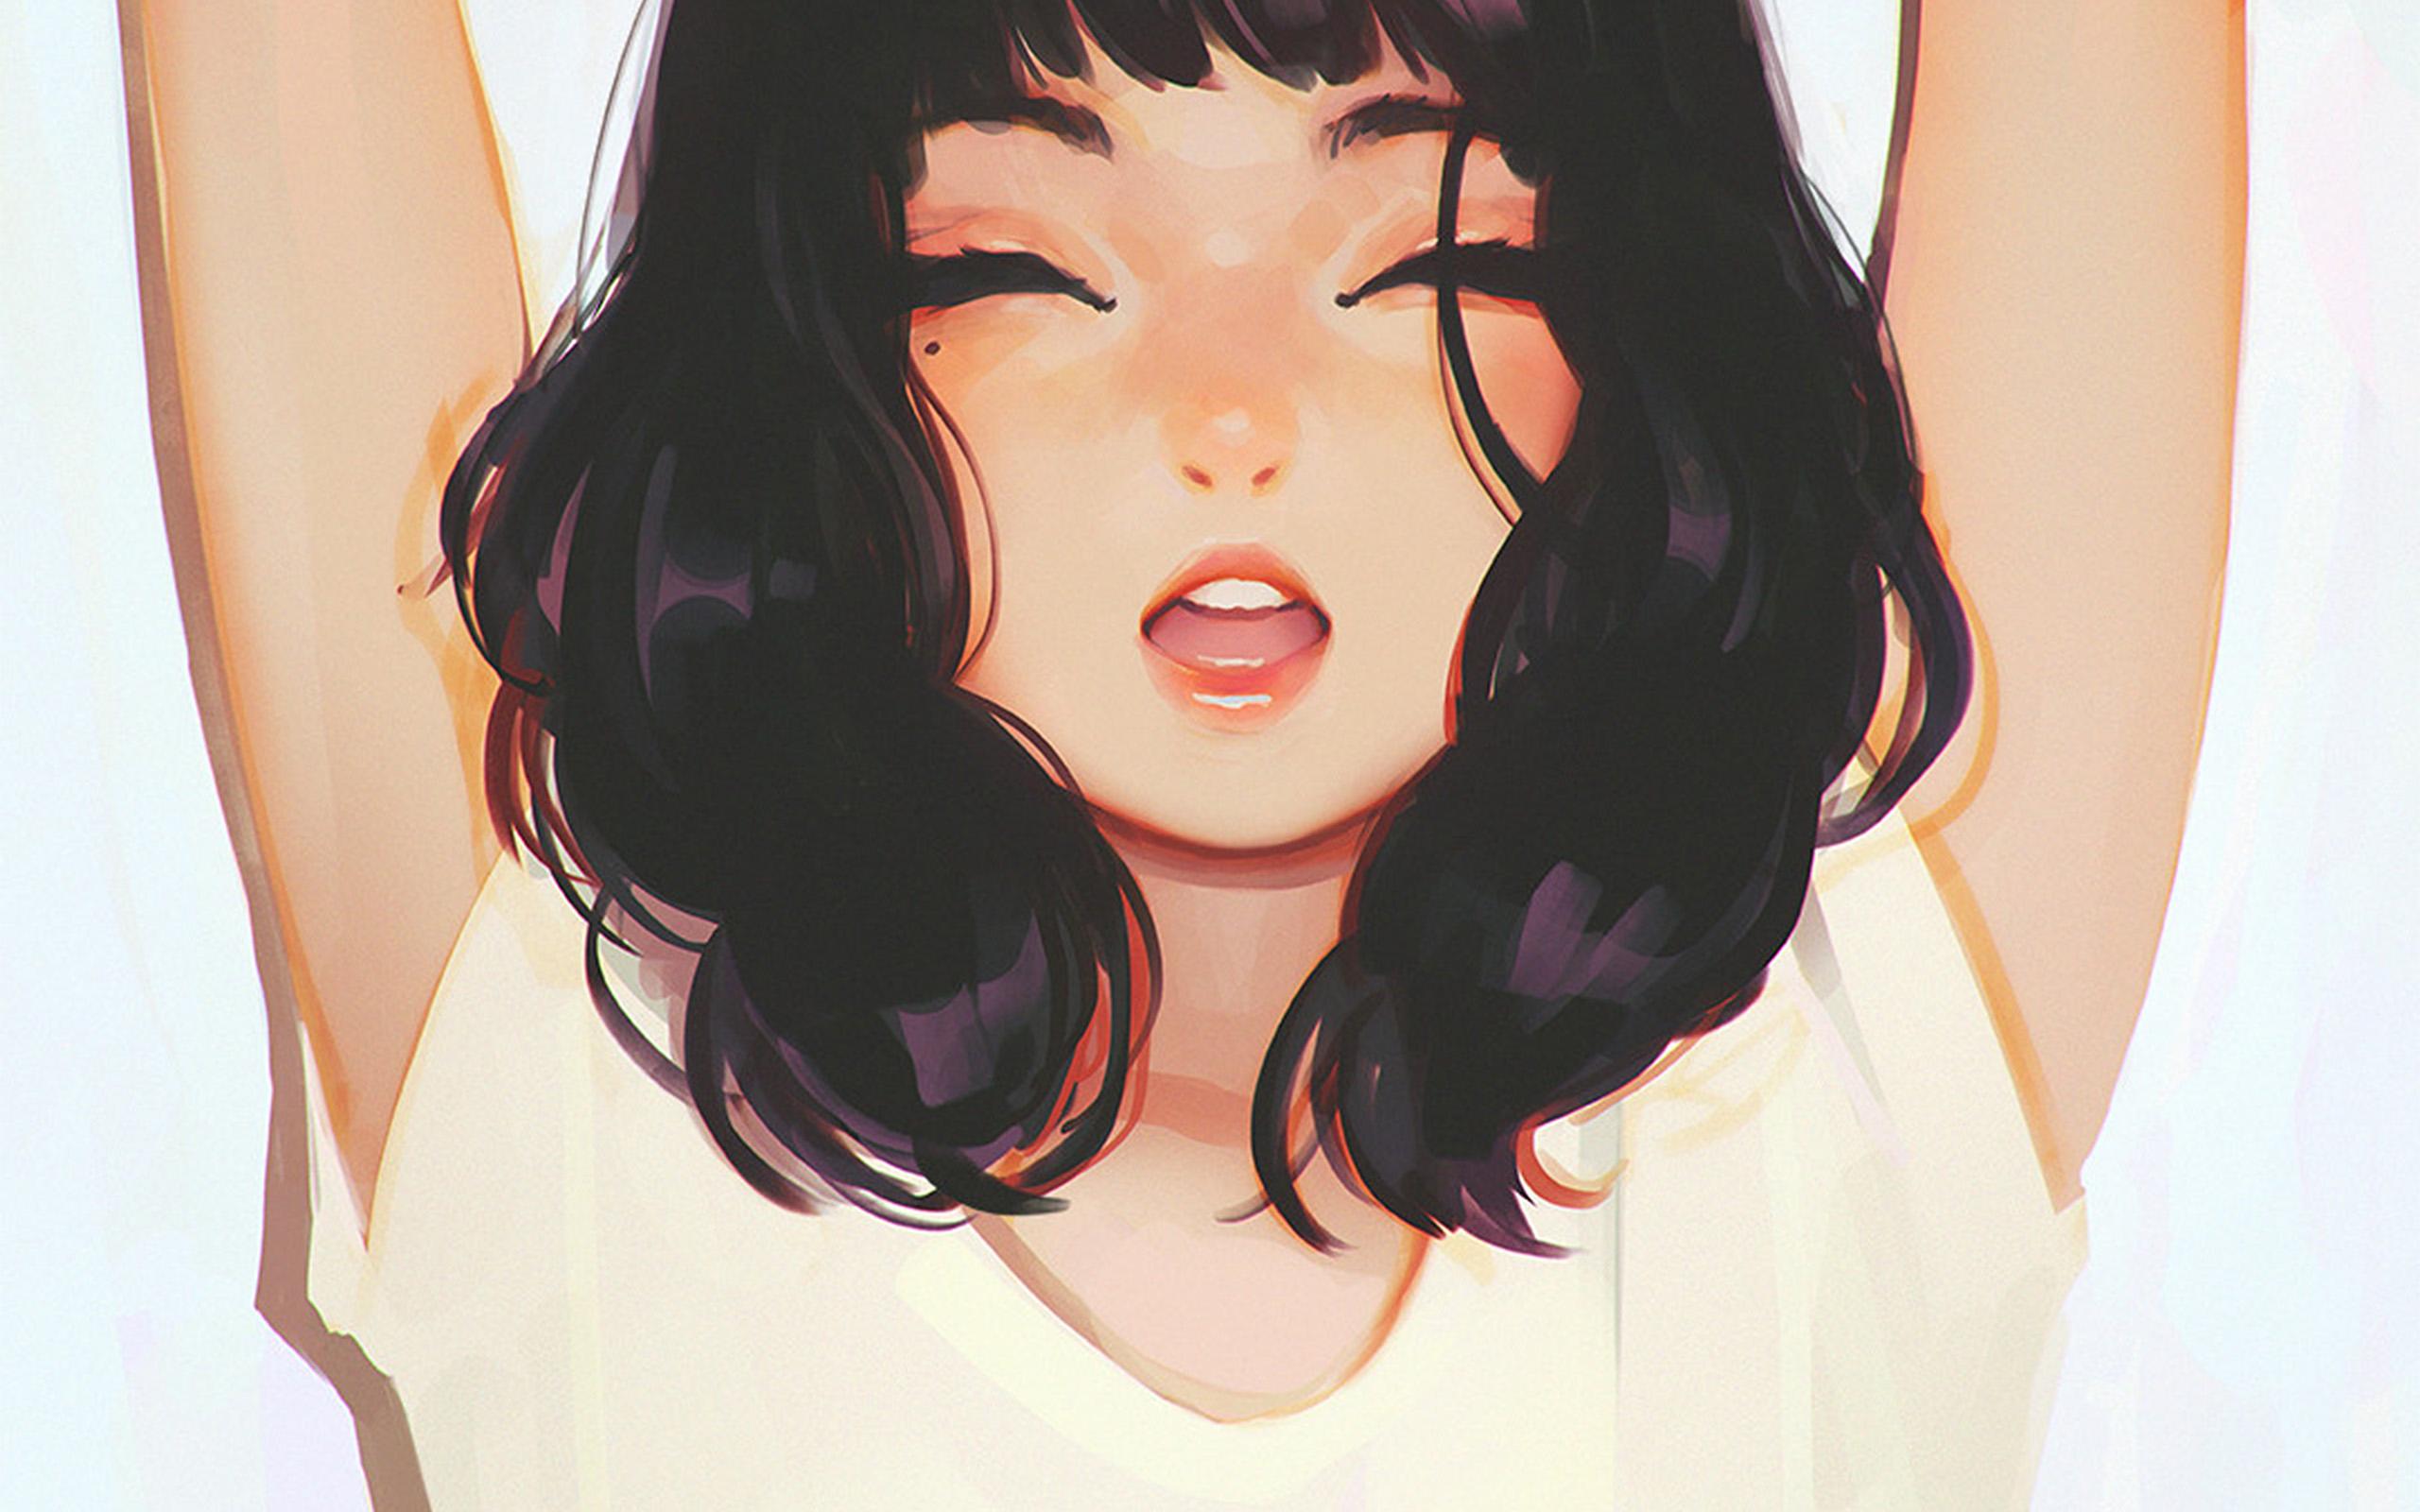 Cute Drawing Desktop Wallpaper Ax04 Girl Smile Ilya Kuvshinov Illustration Art Wallpaper